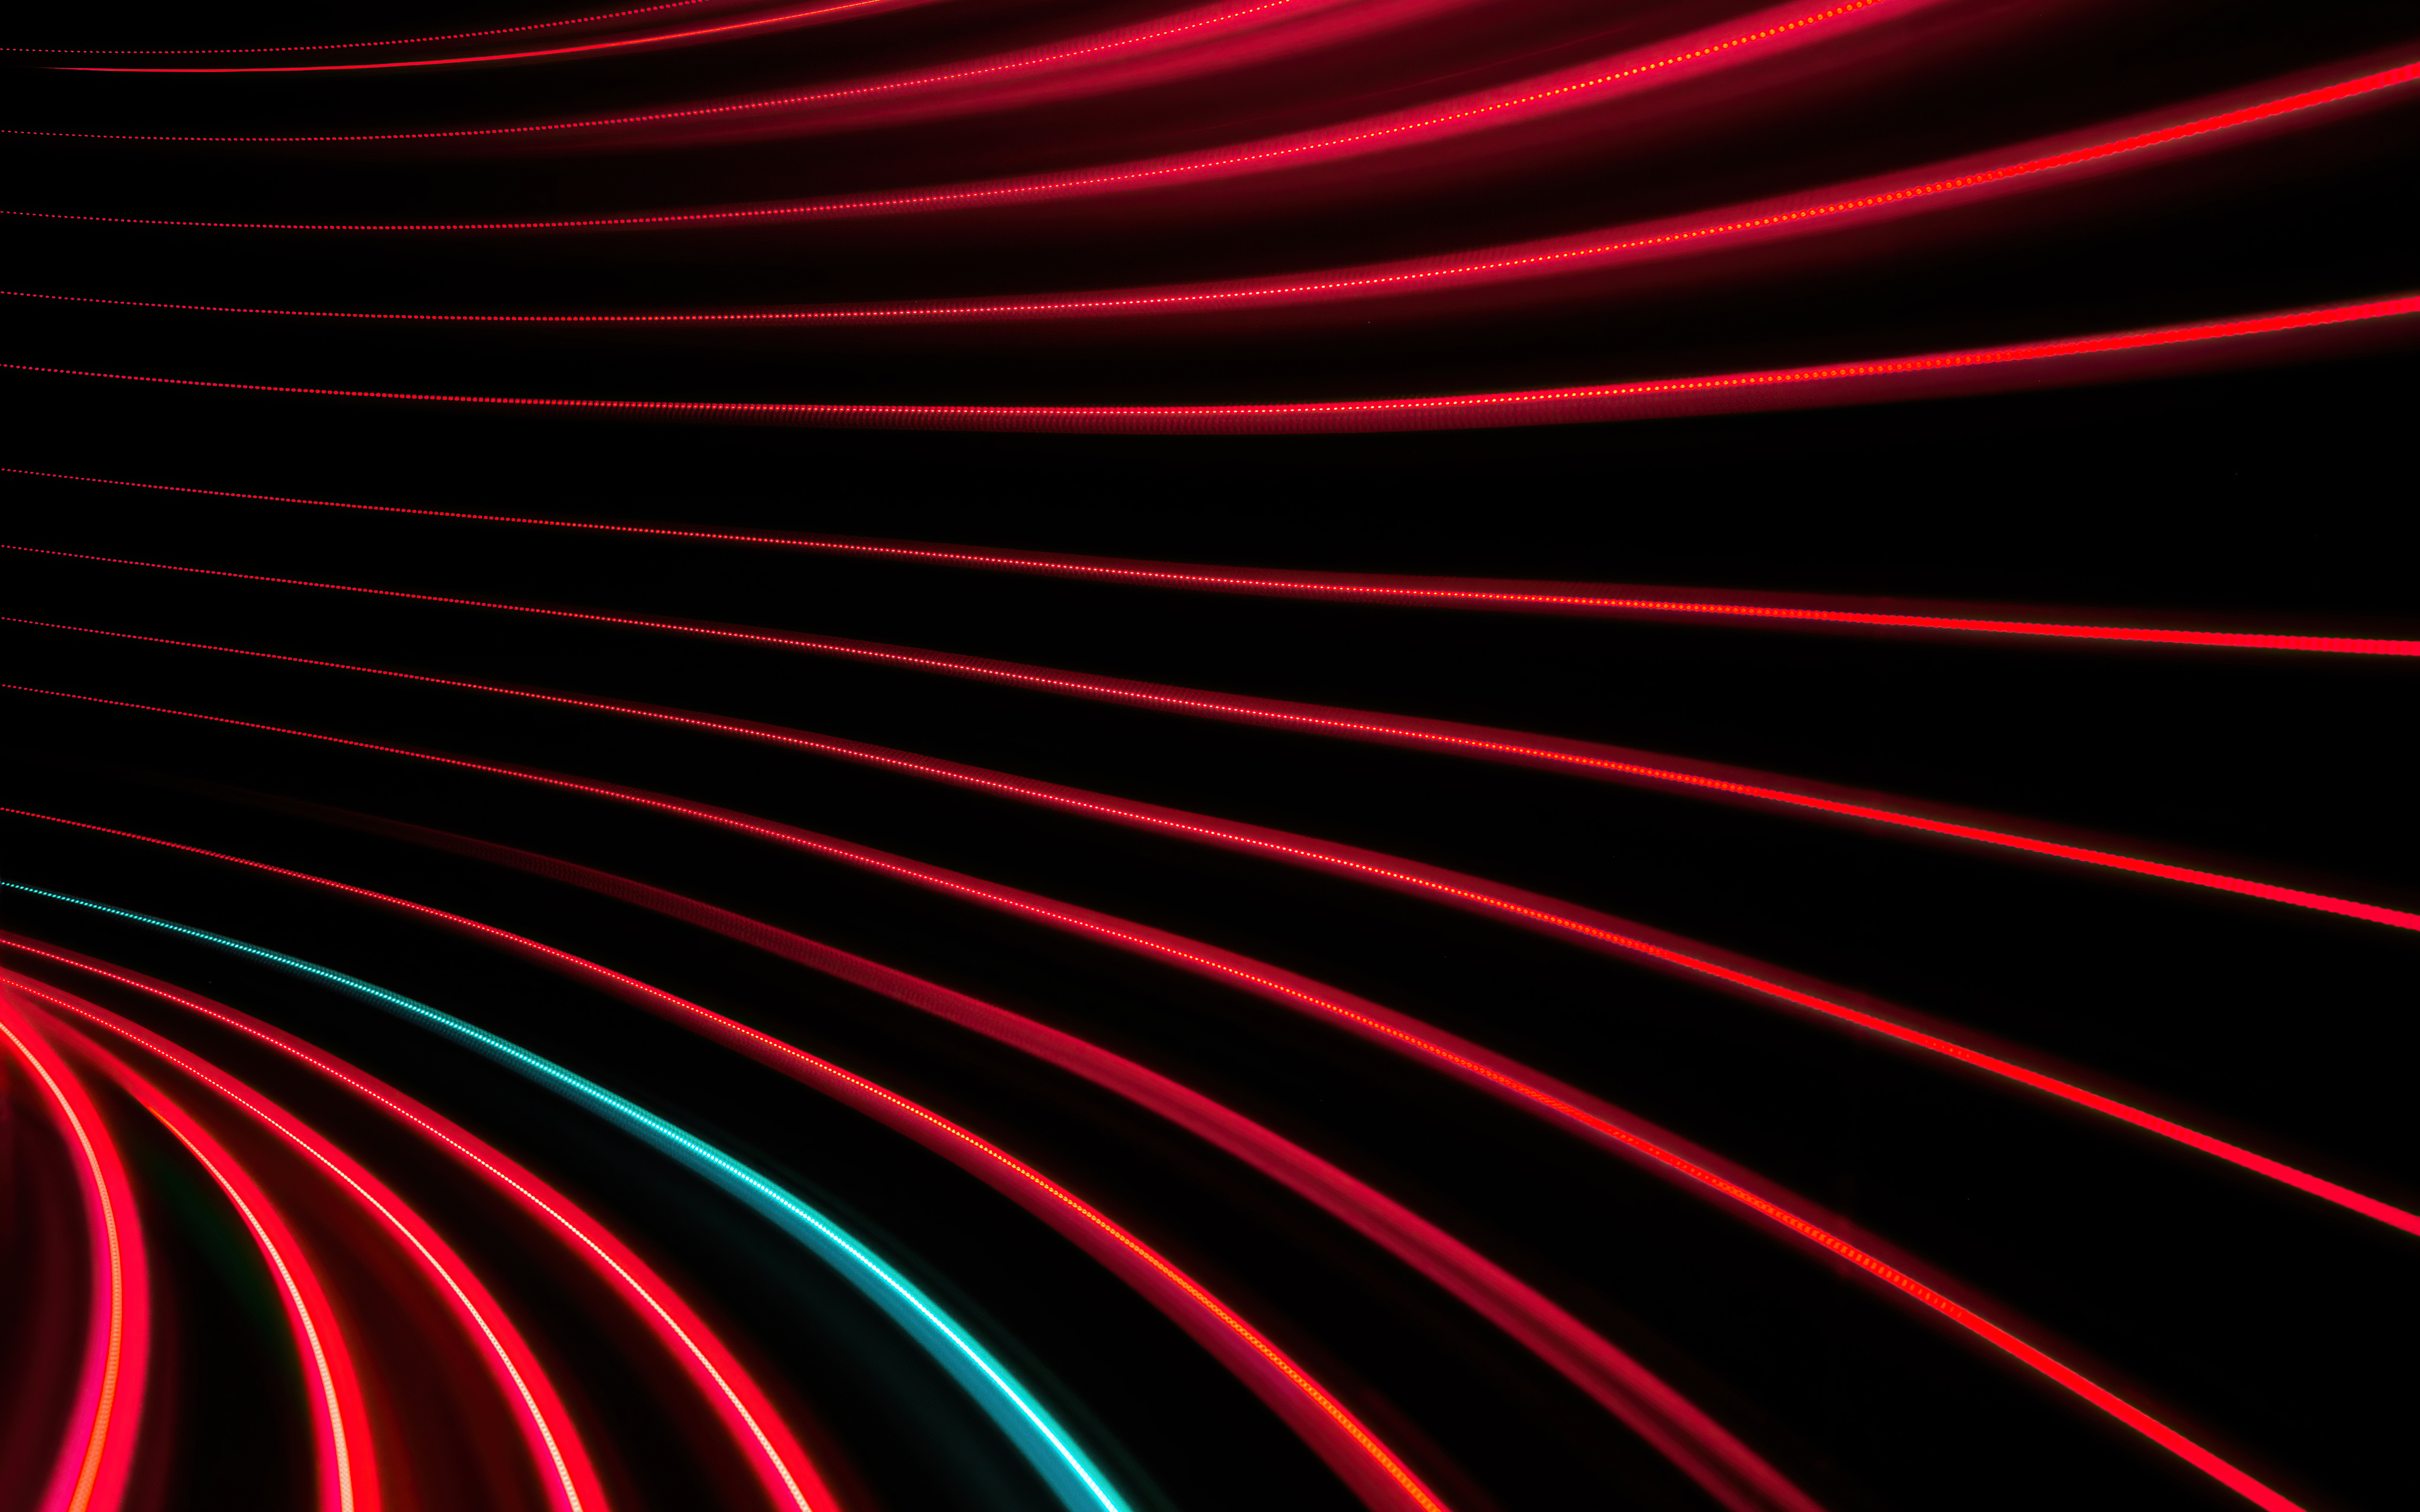 red-and-black-swirl-pattern-5k-8r.jpg